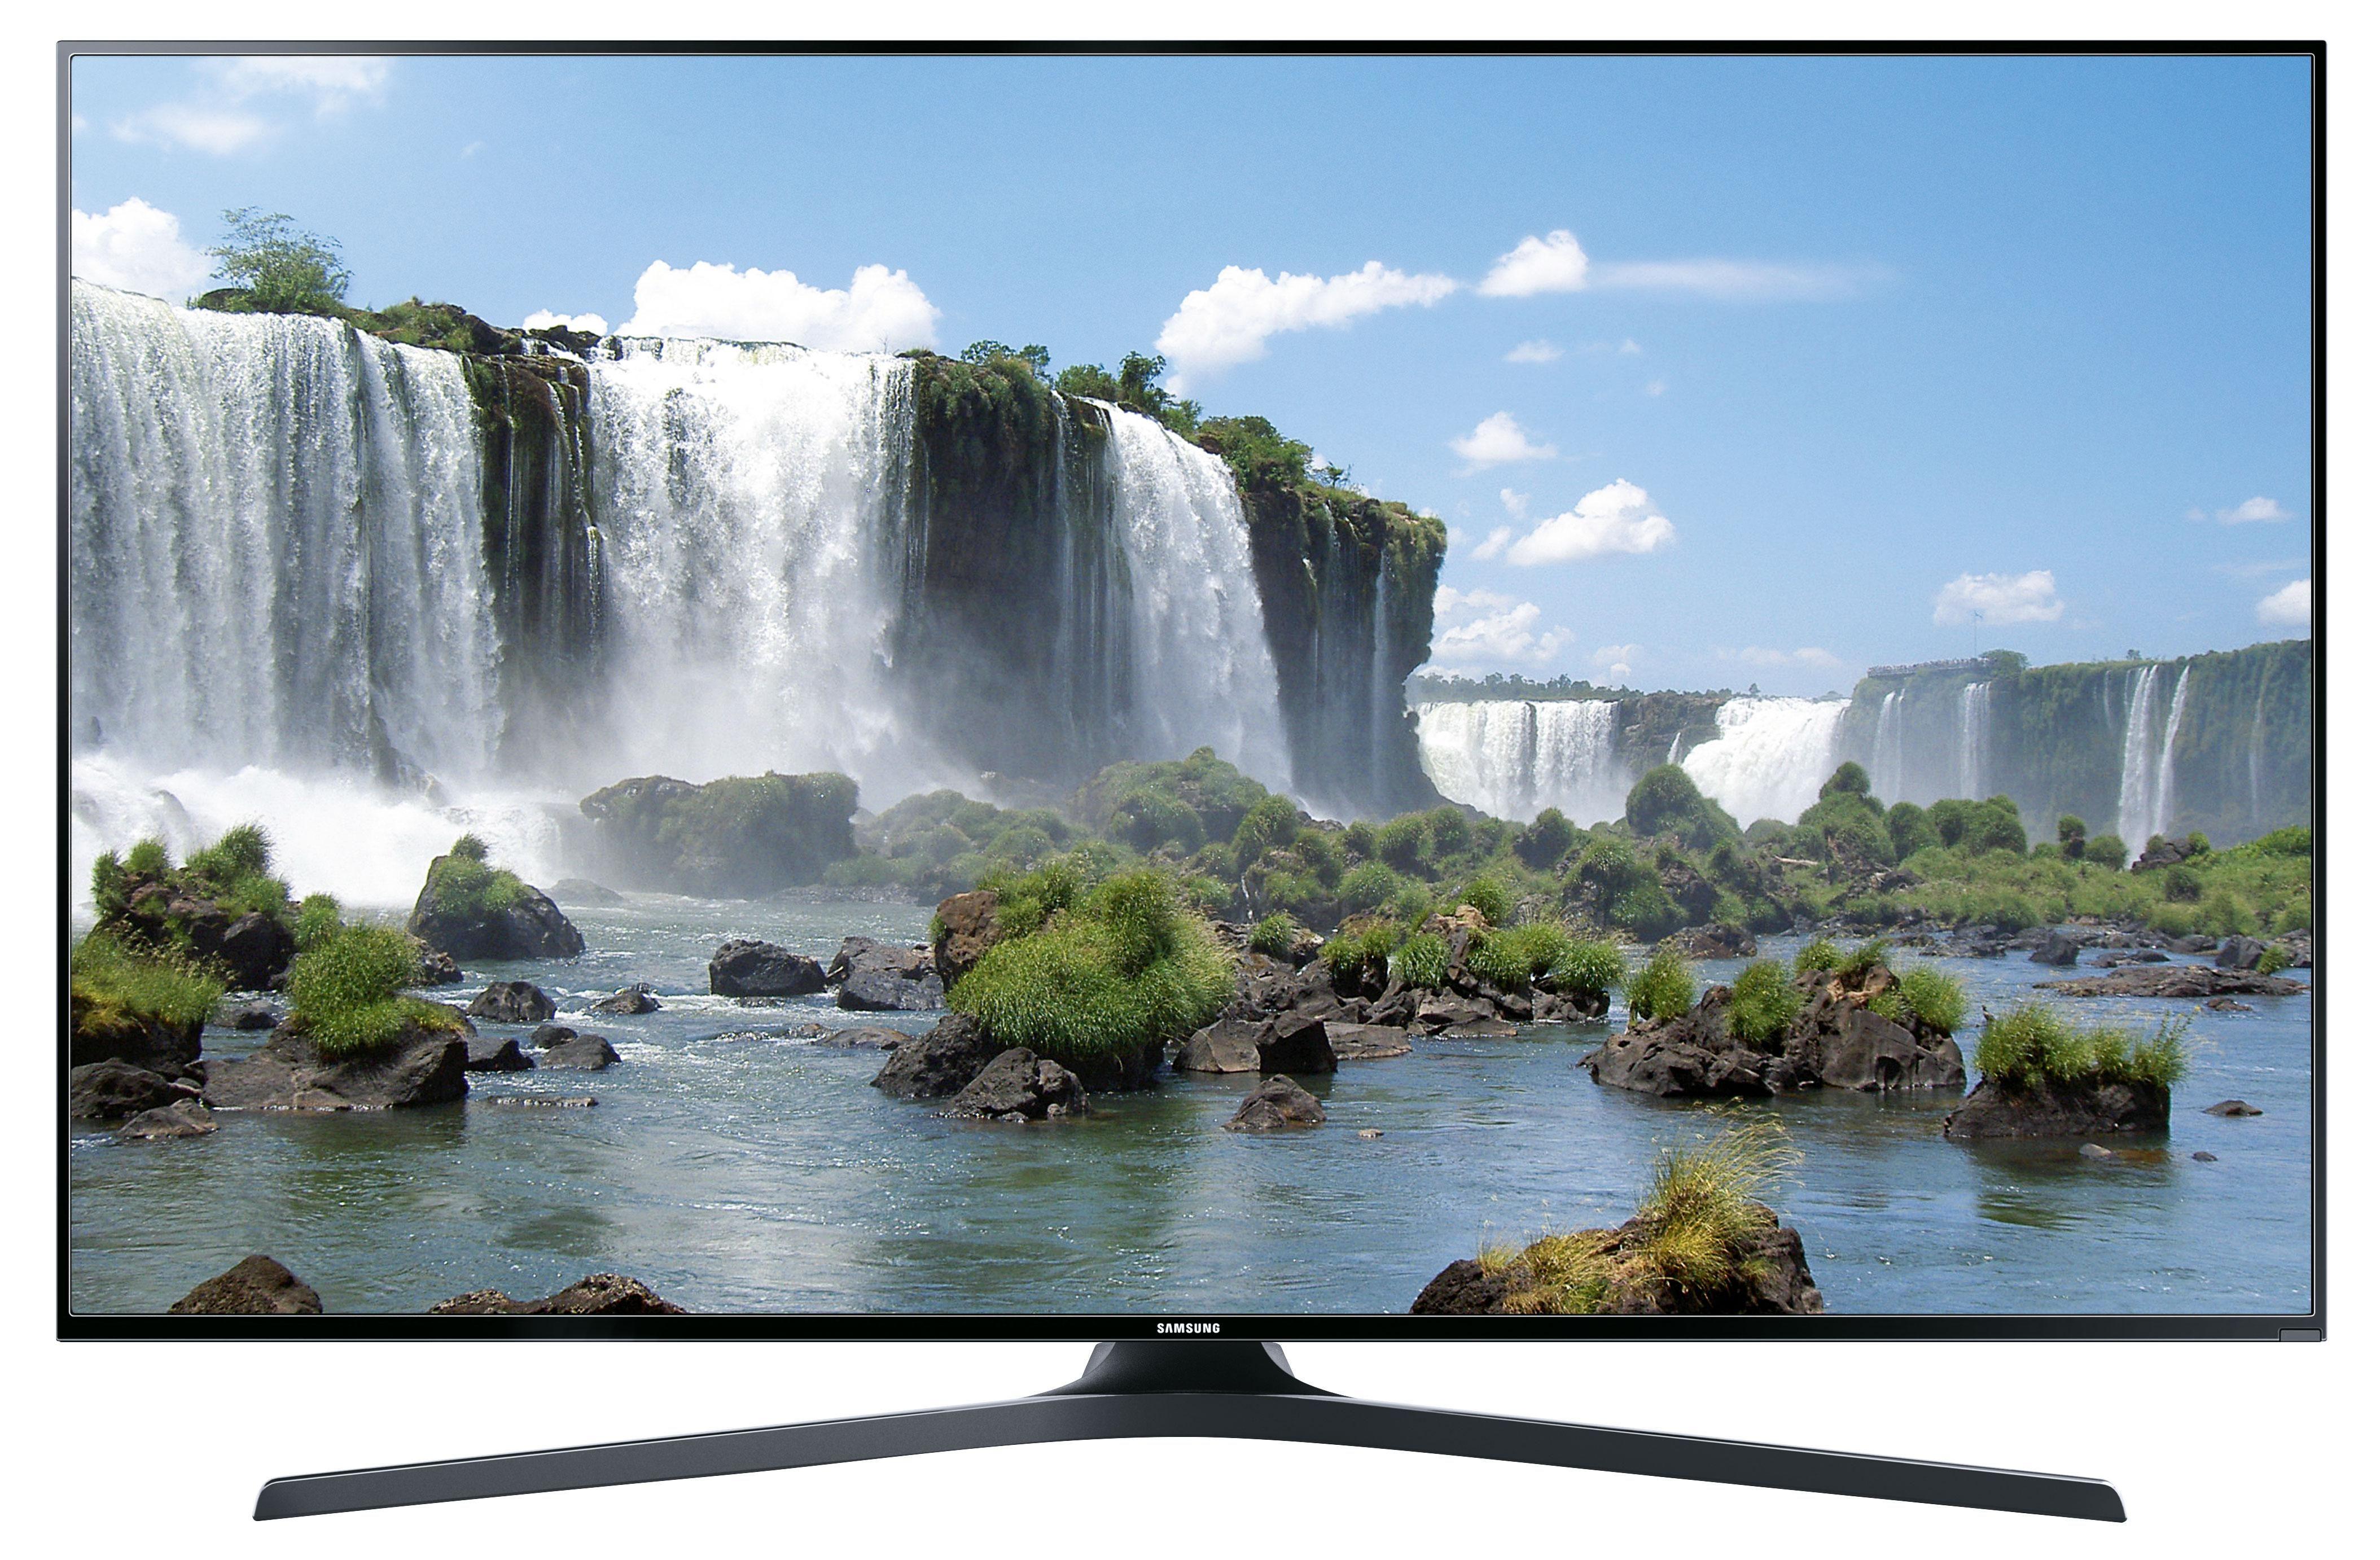 Samsung J6250 LED Backlight Fernseher